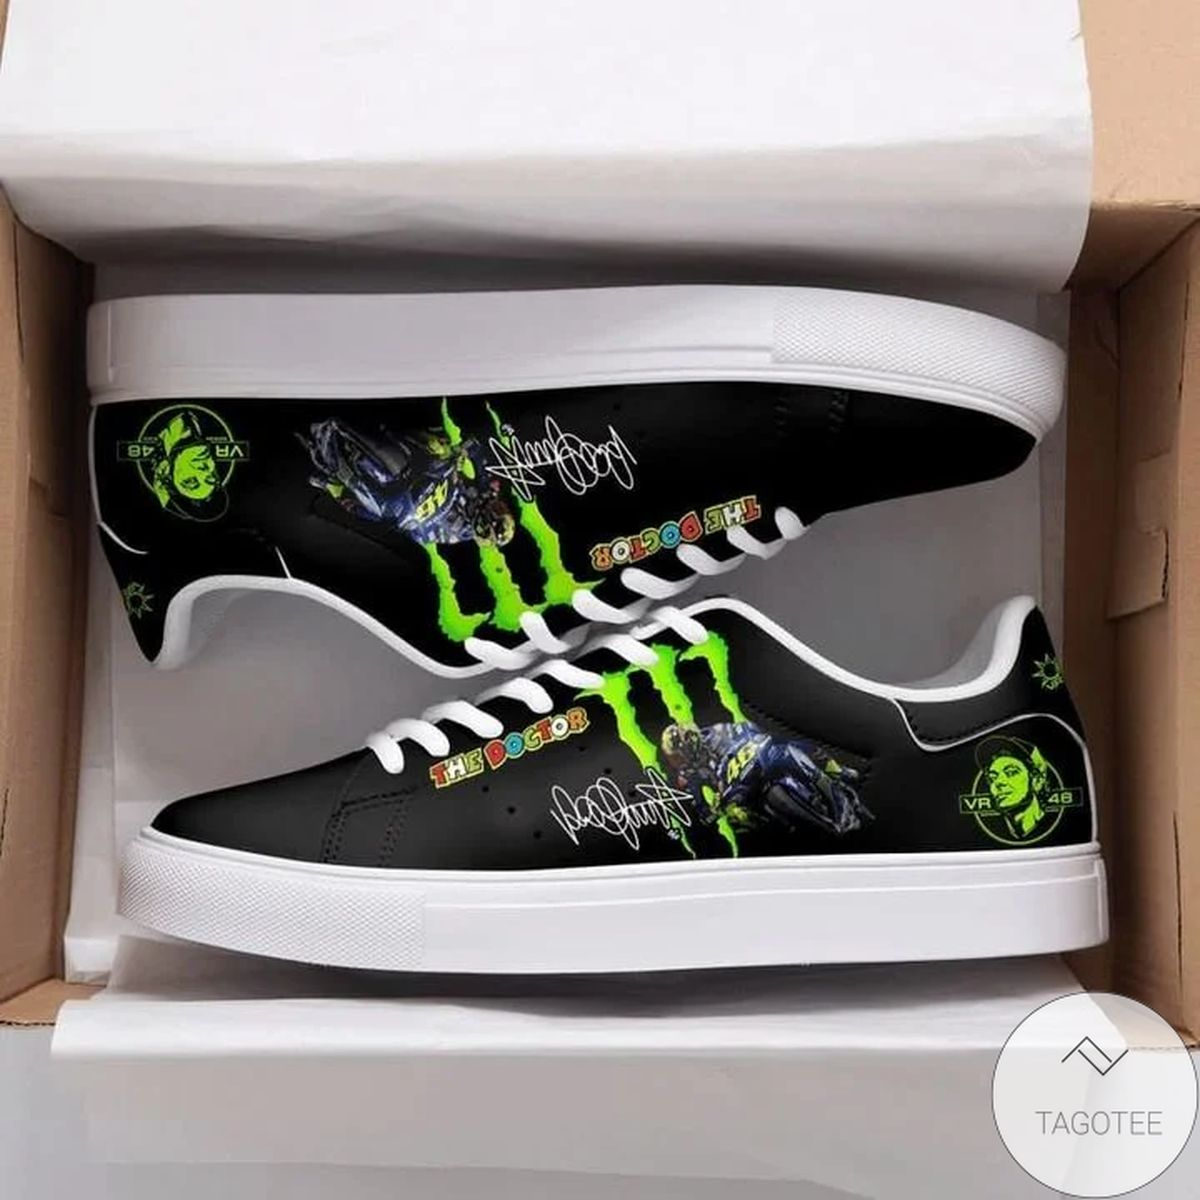 Vr46 Black Stan Smith Shoes